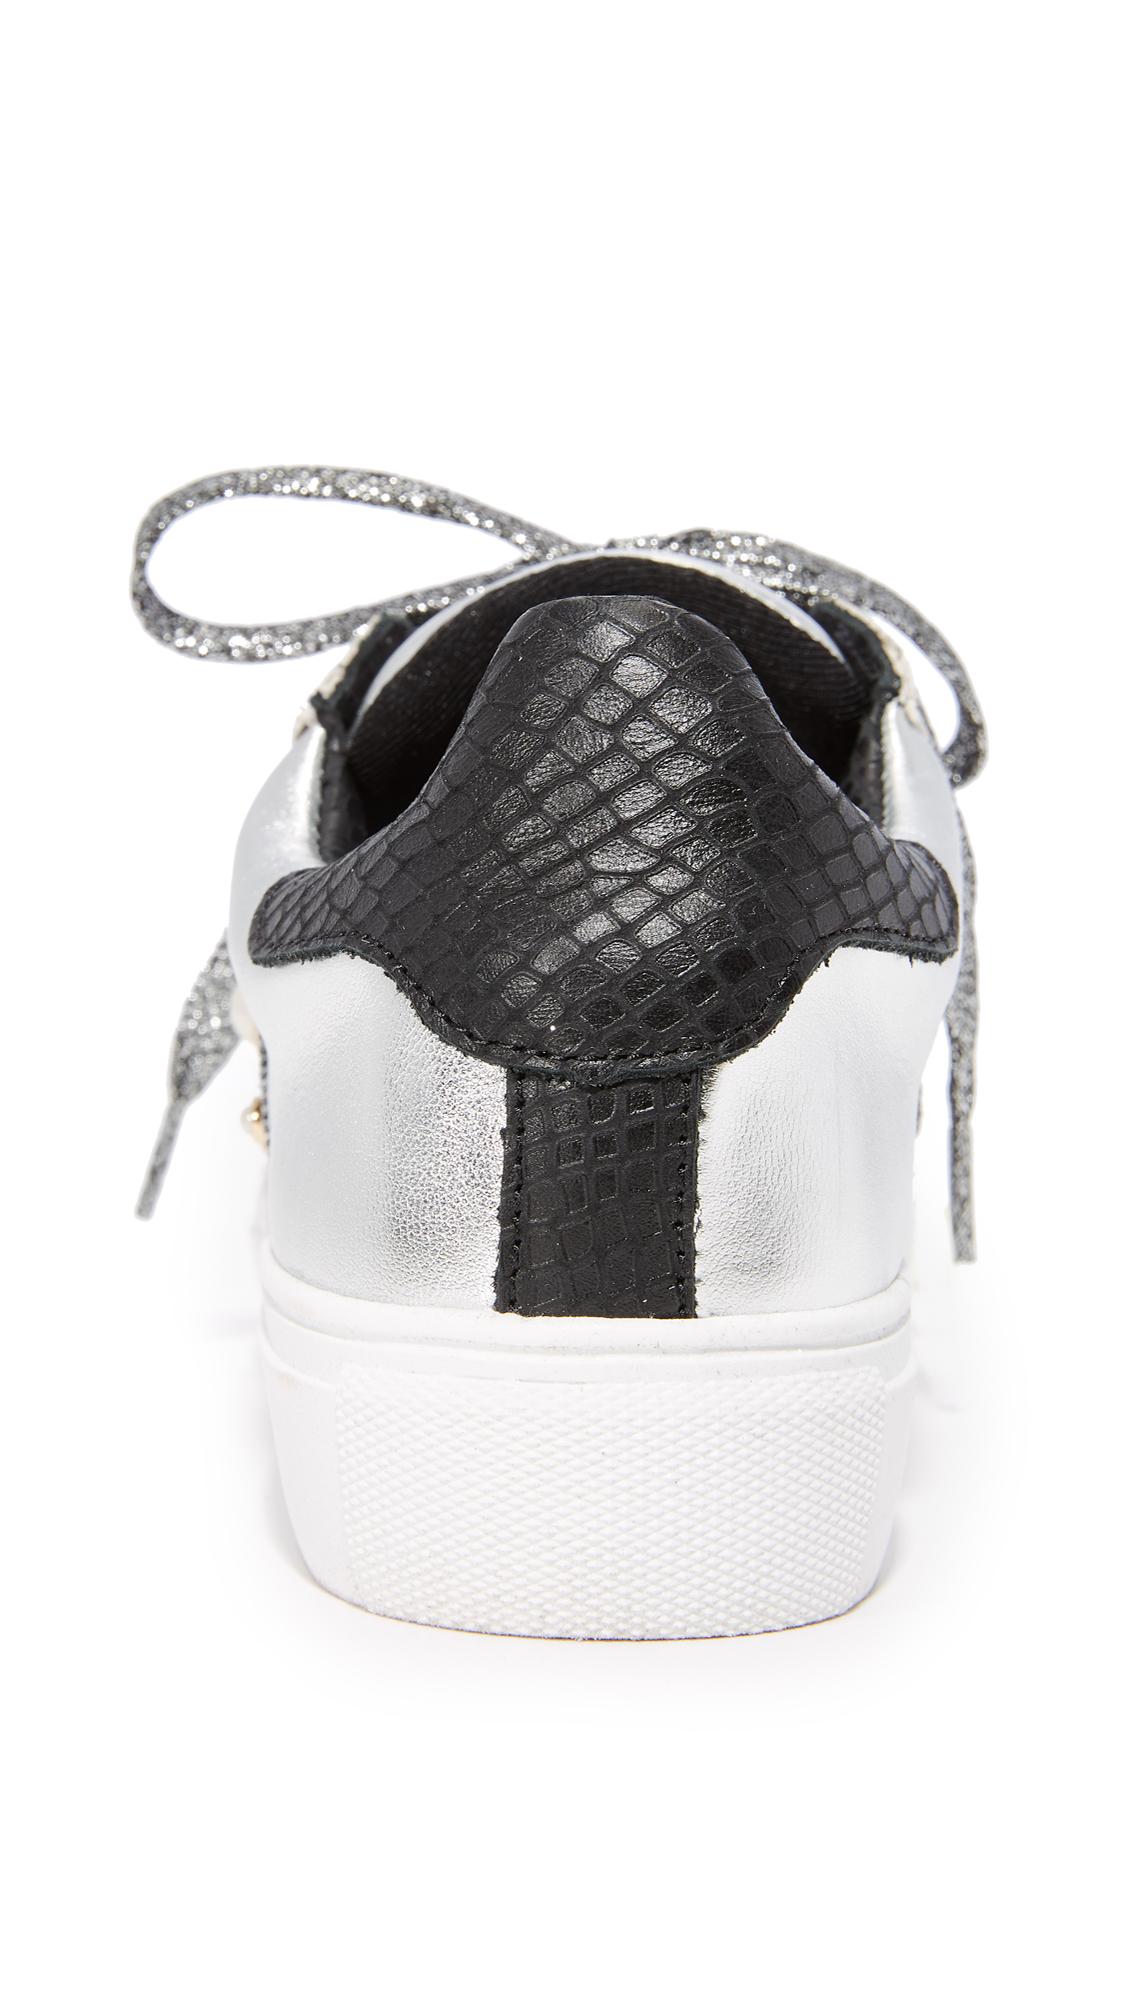 be48ecd1879 Steven Cory Classic Sneakers